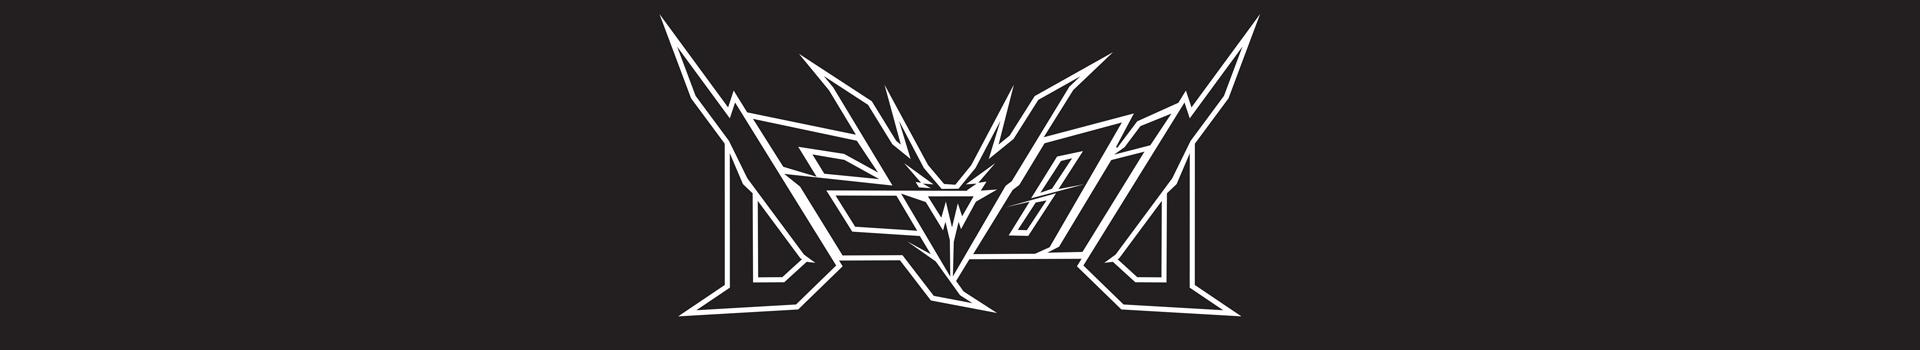 Devoid - Official Merchandise